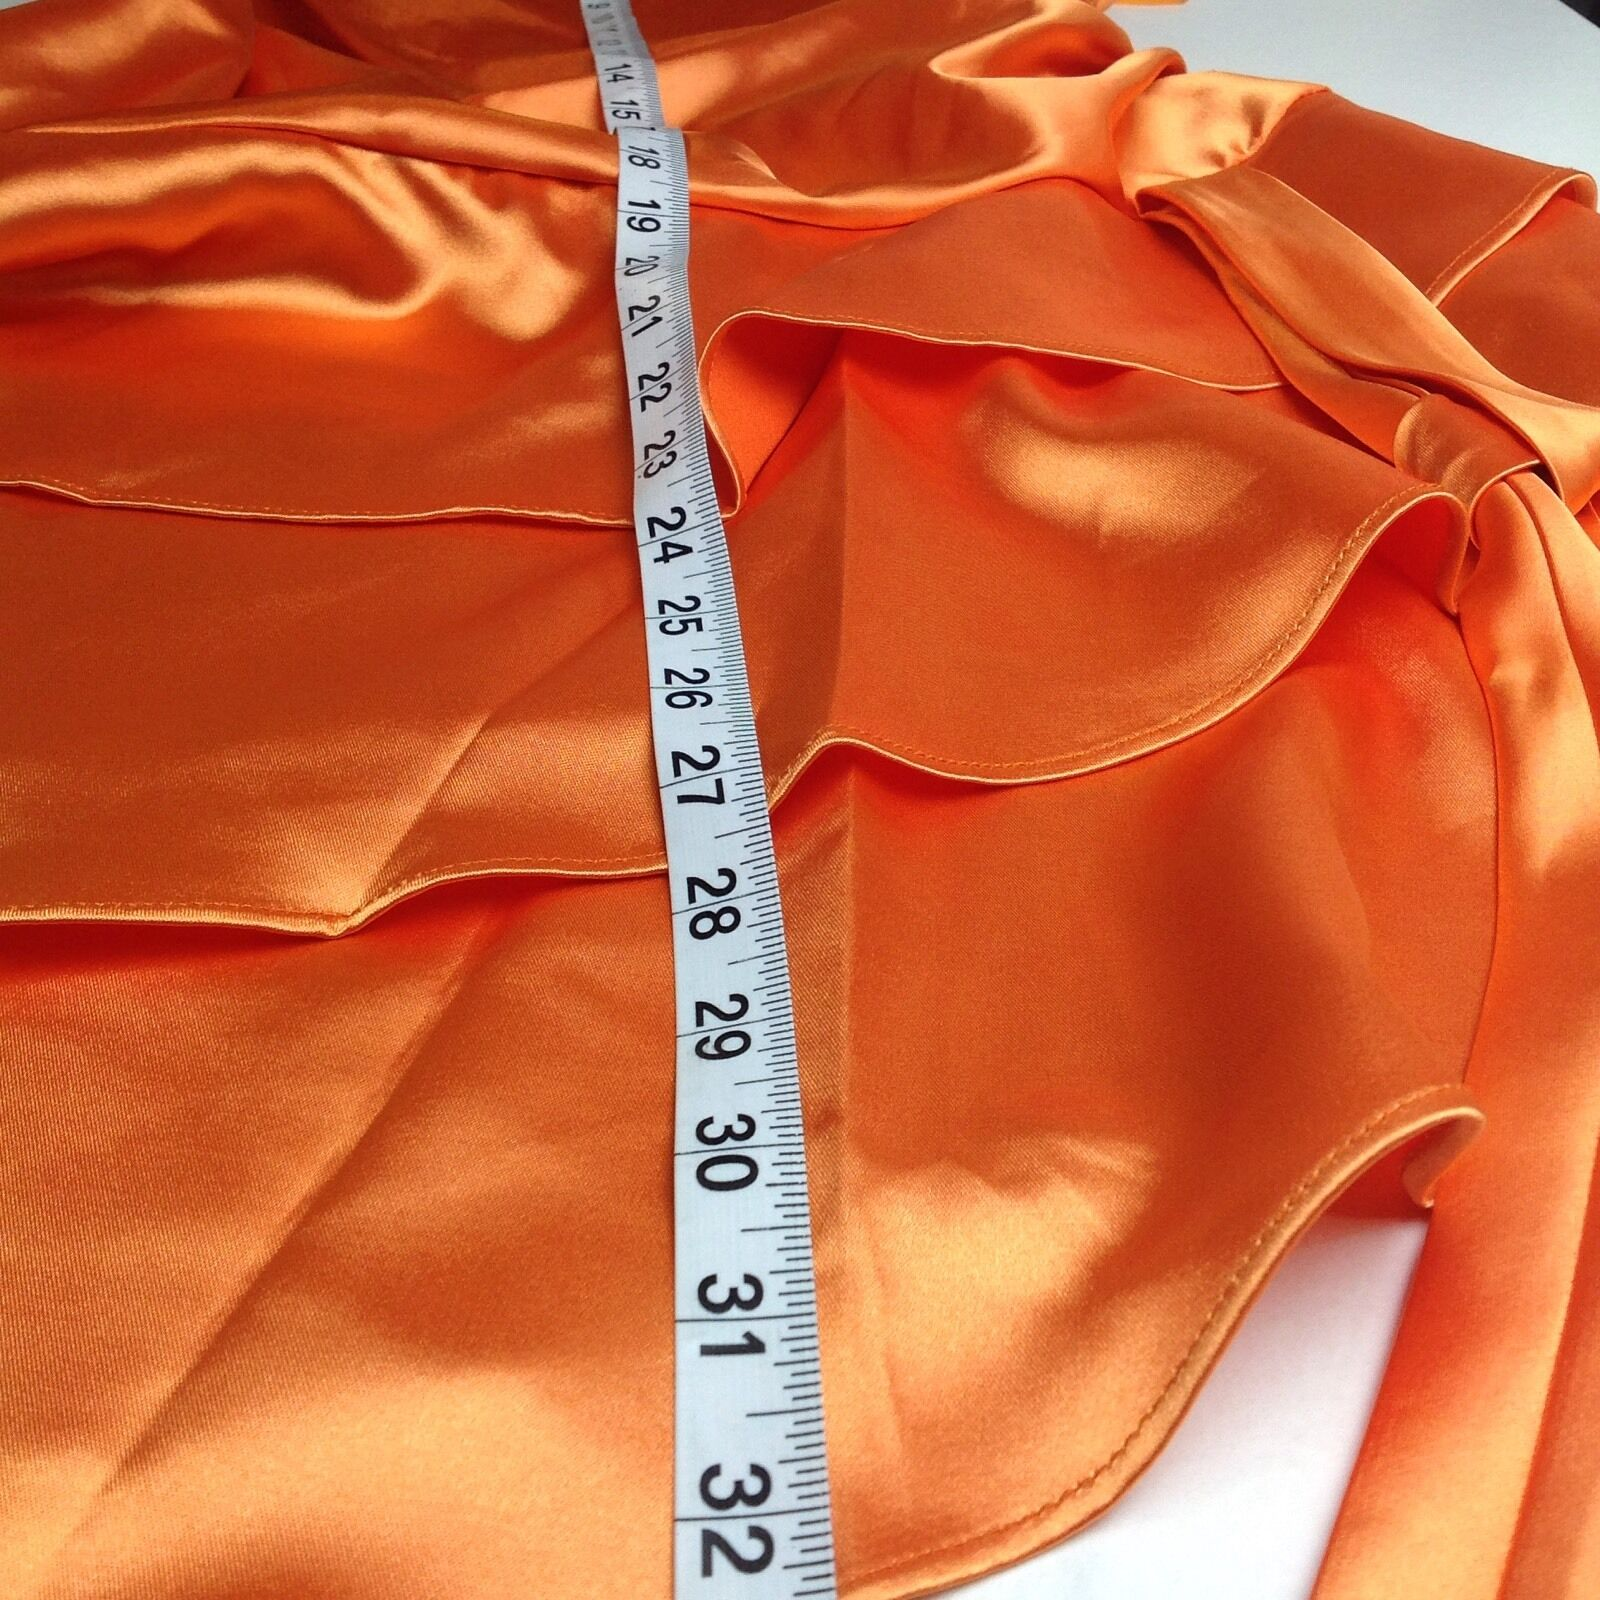 Cinderella Design Design Design orange Satin Spaghetti Strap Asymmetrical Tango Dress Size Sm 6cdb05